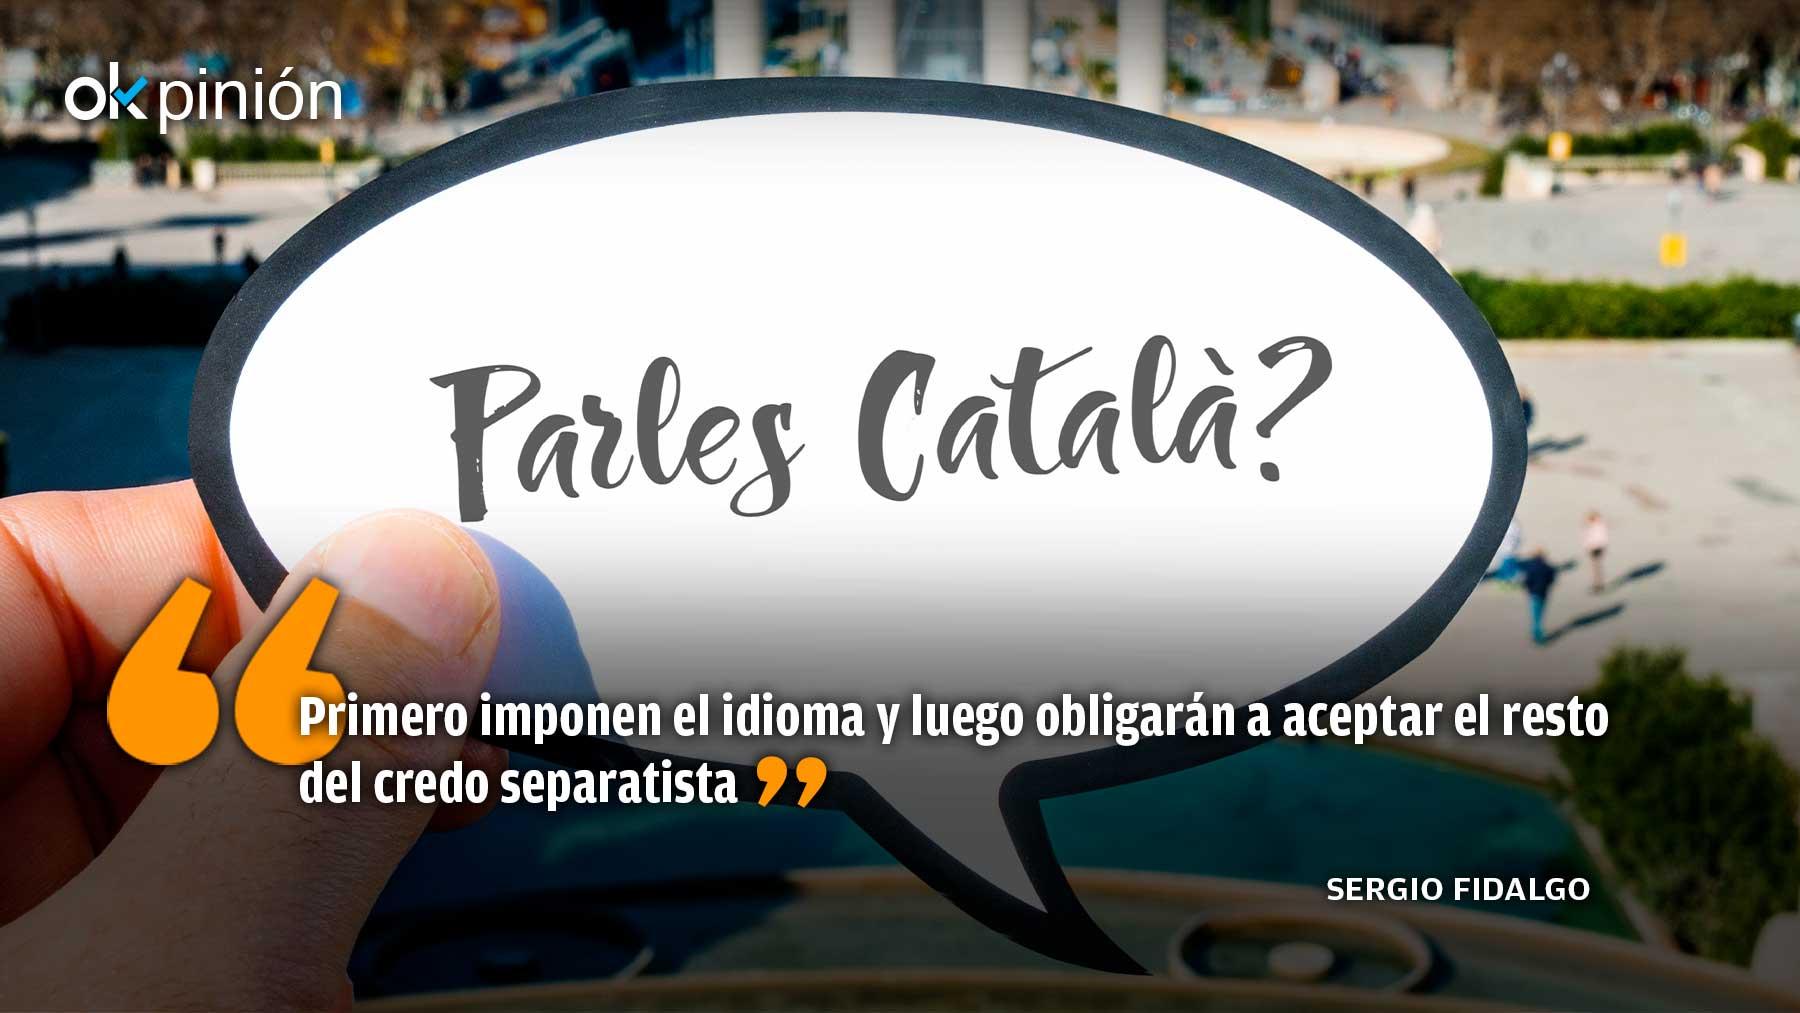 Catalan will set you free